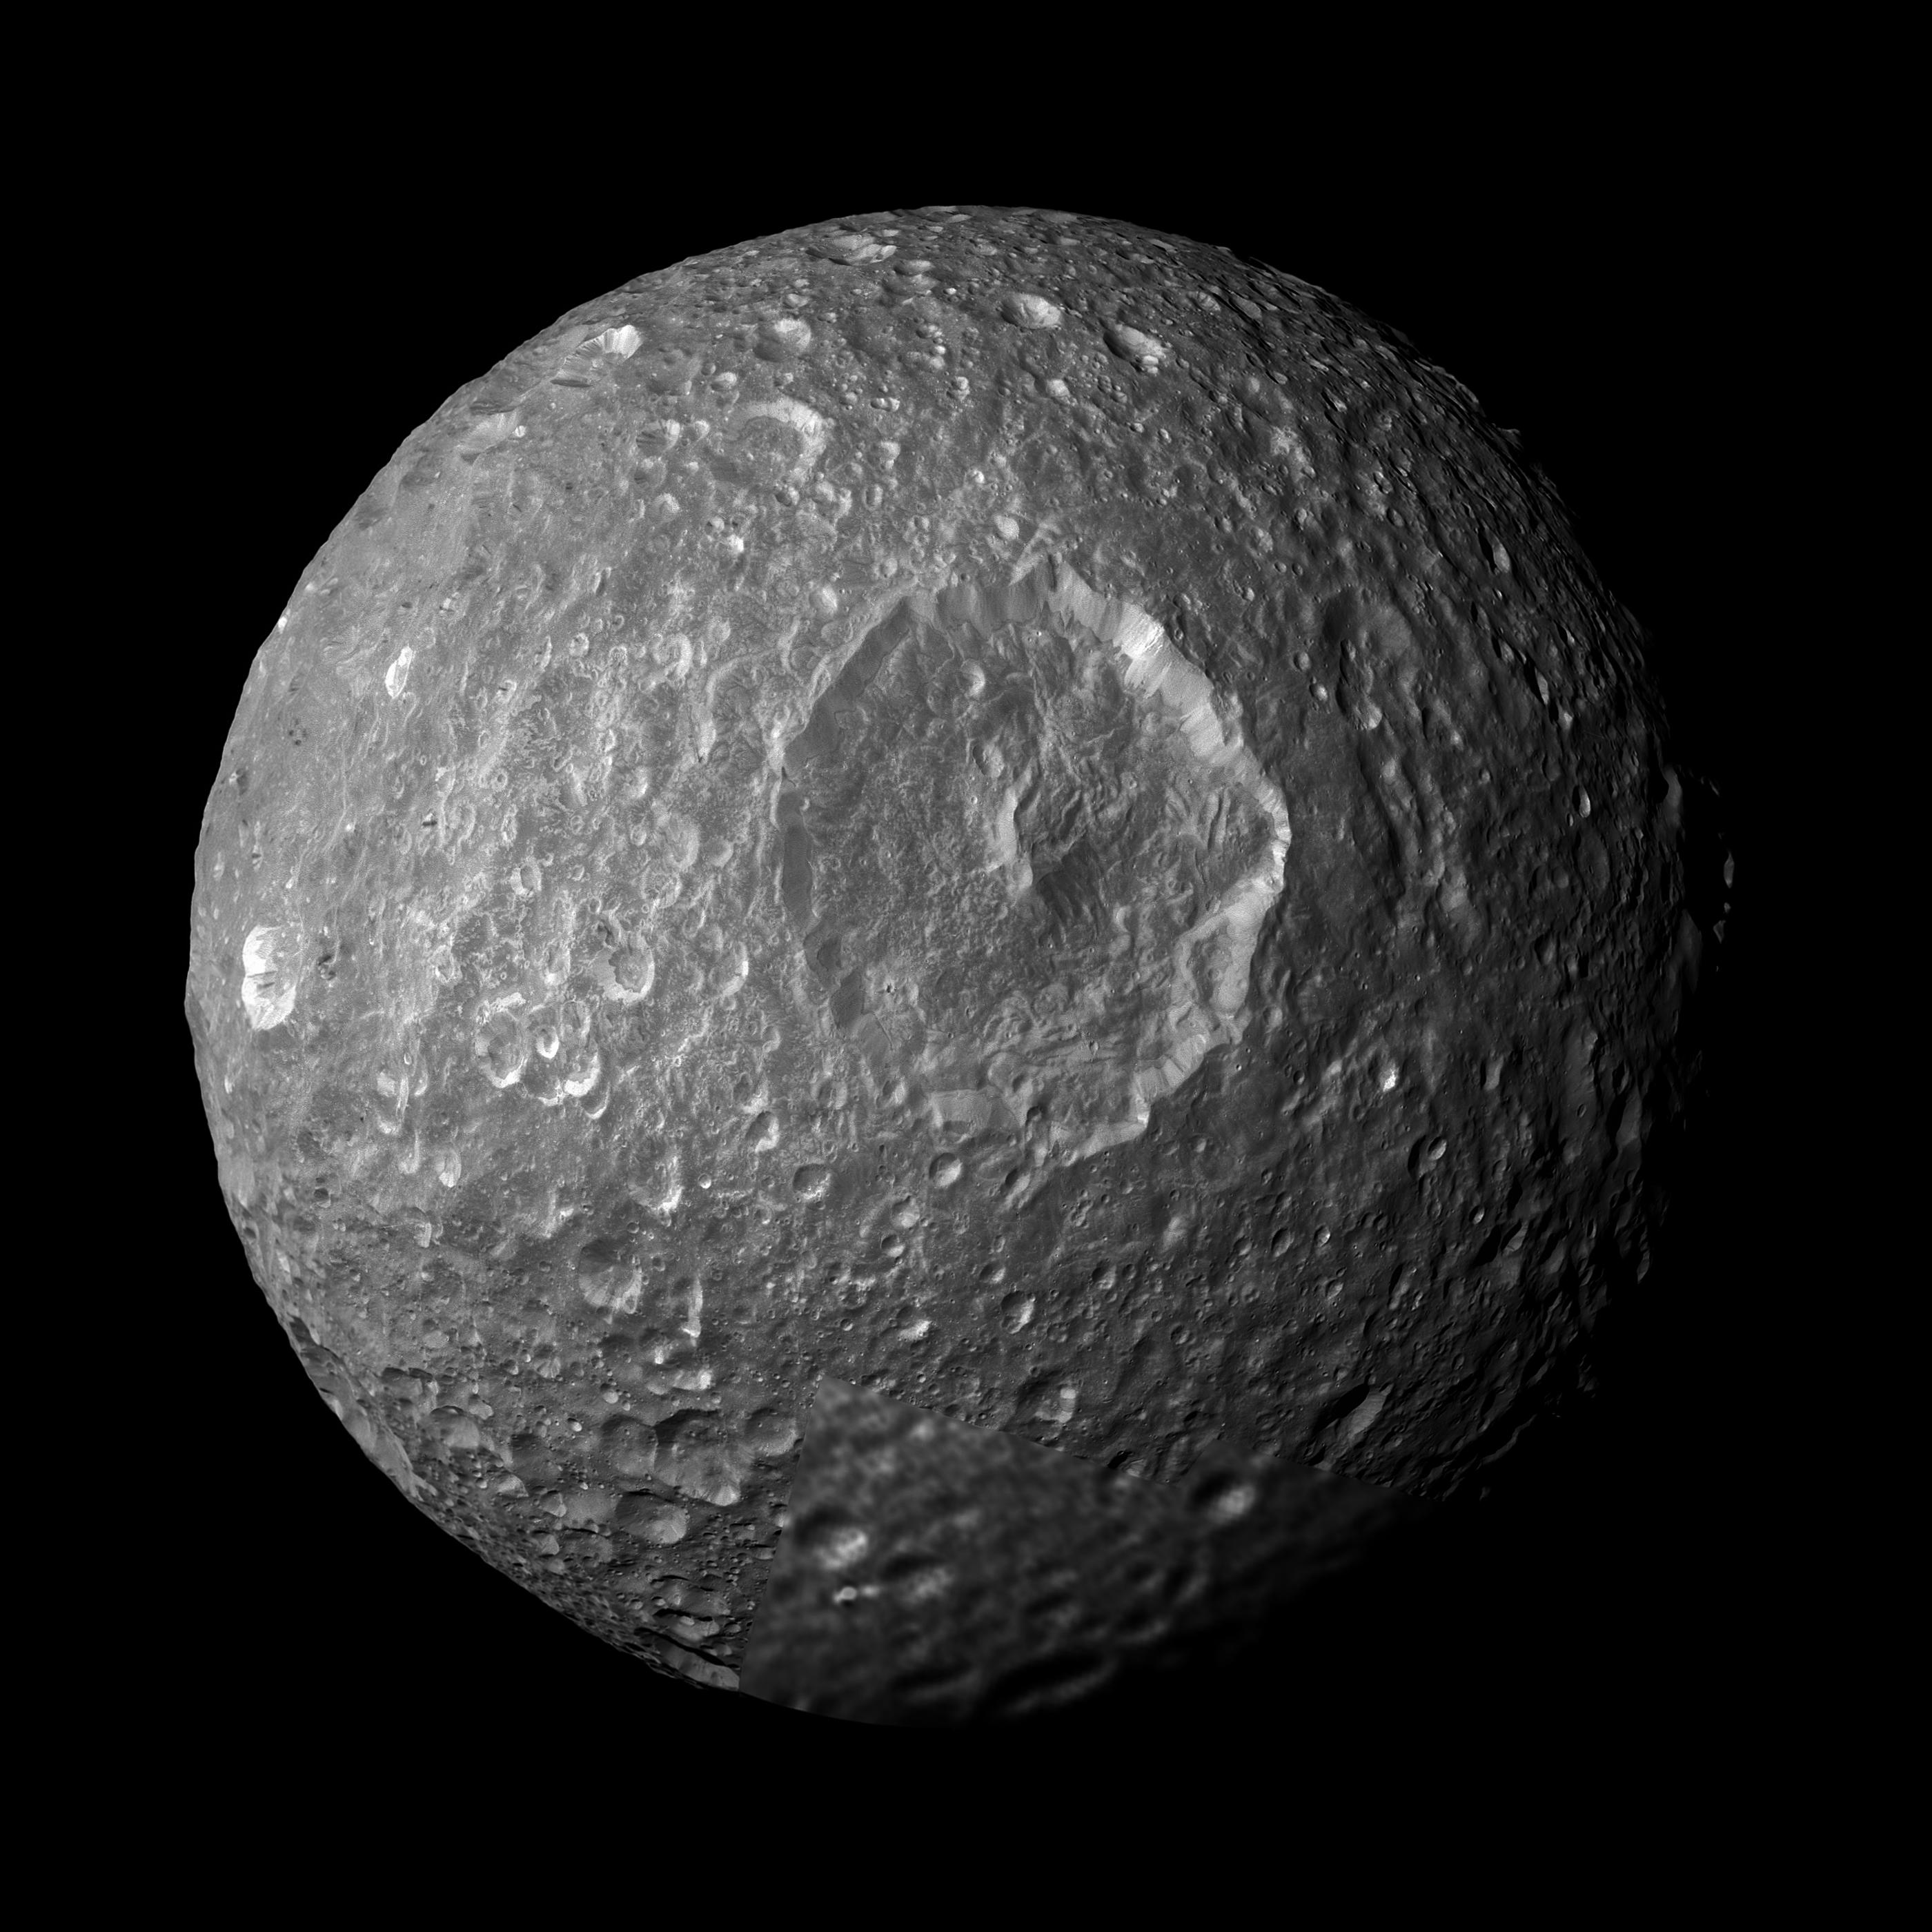 Mimas: Saturn's Death Star Moon